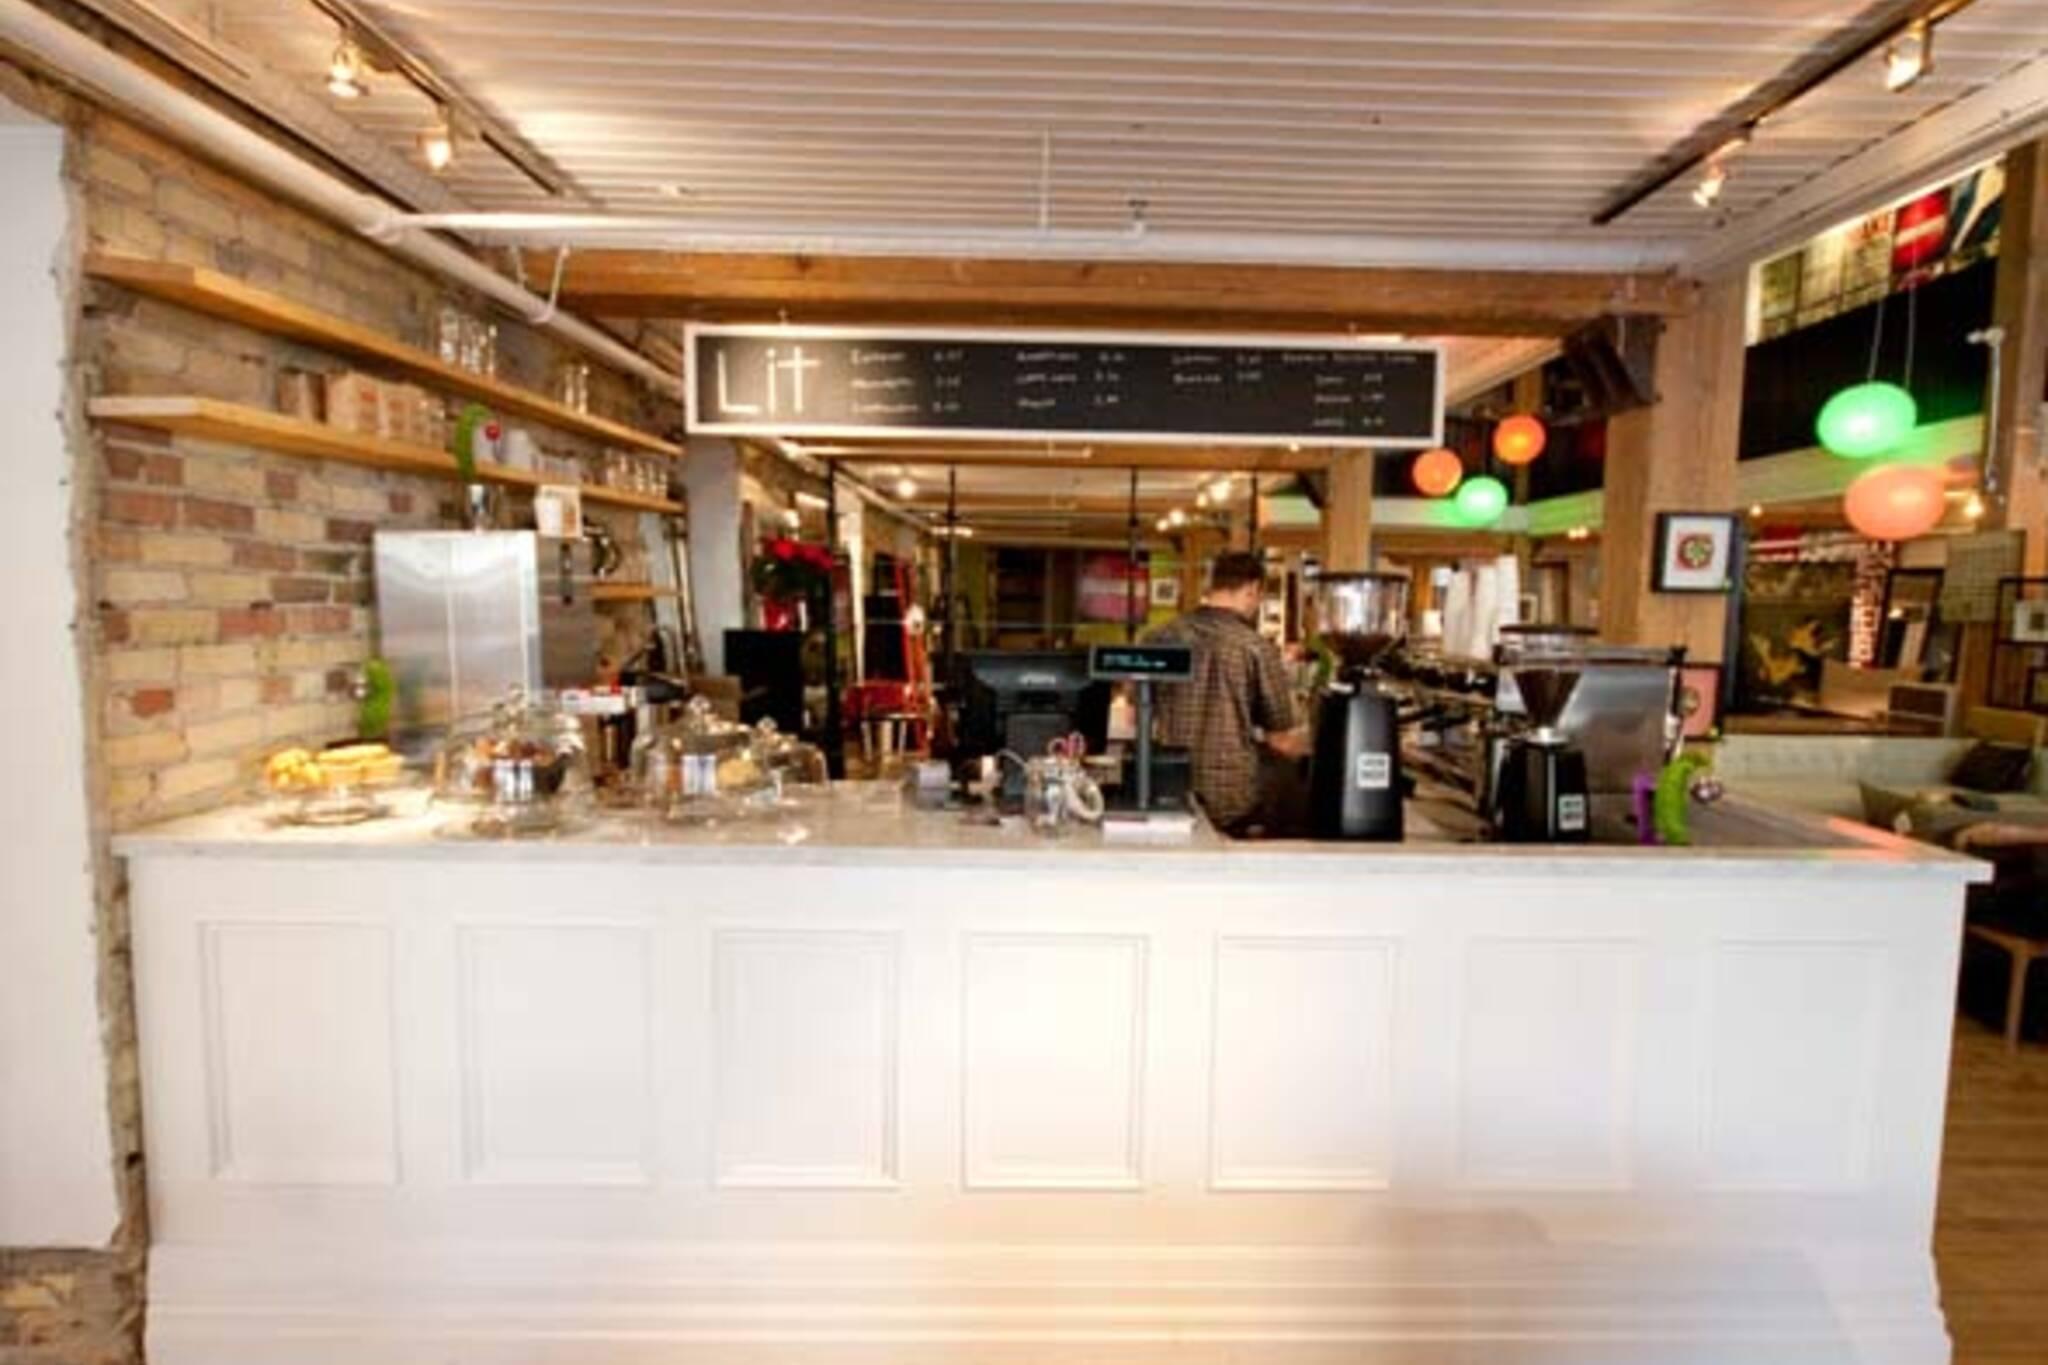 Lit Espresso Bar